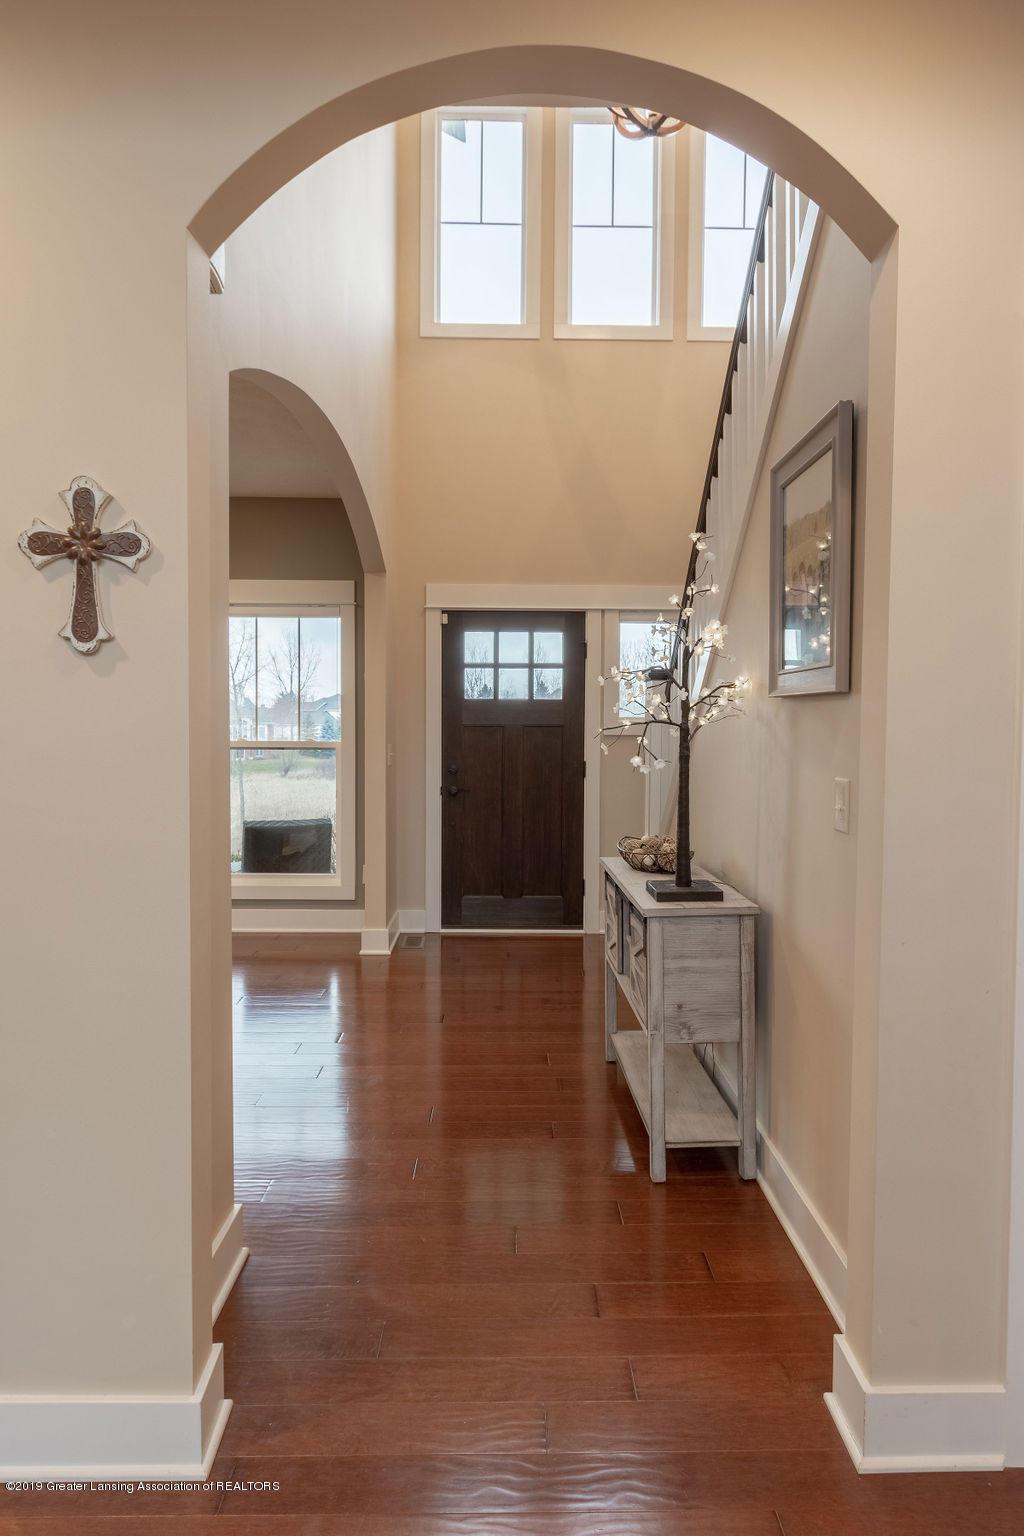 6103 Southridge Rd - interior space - 10